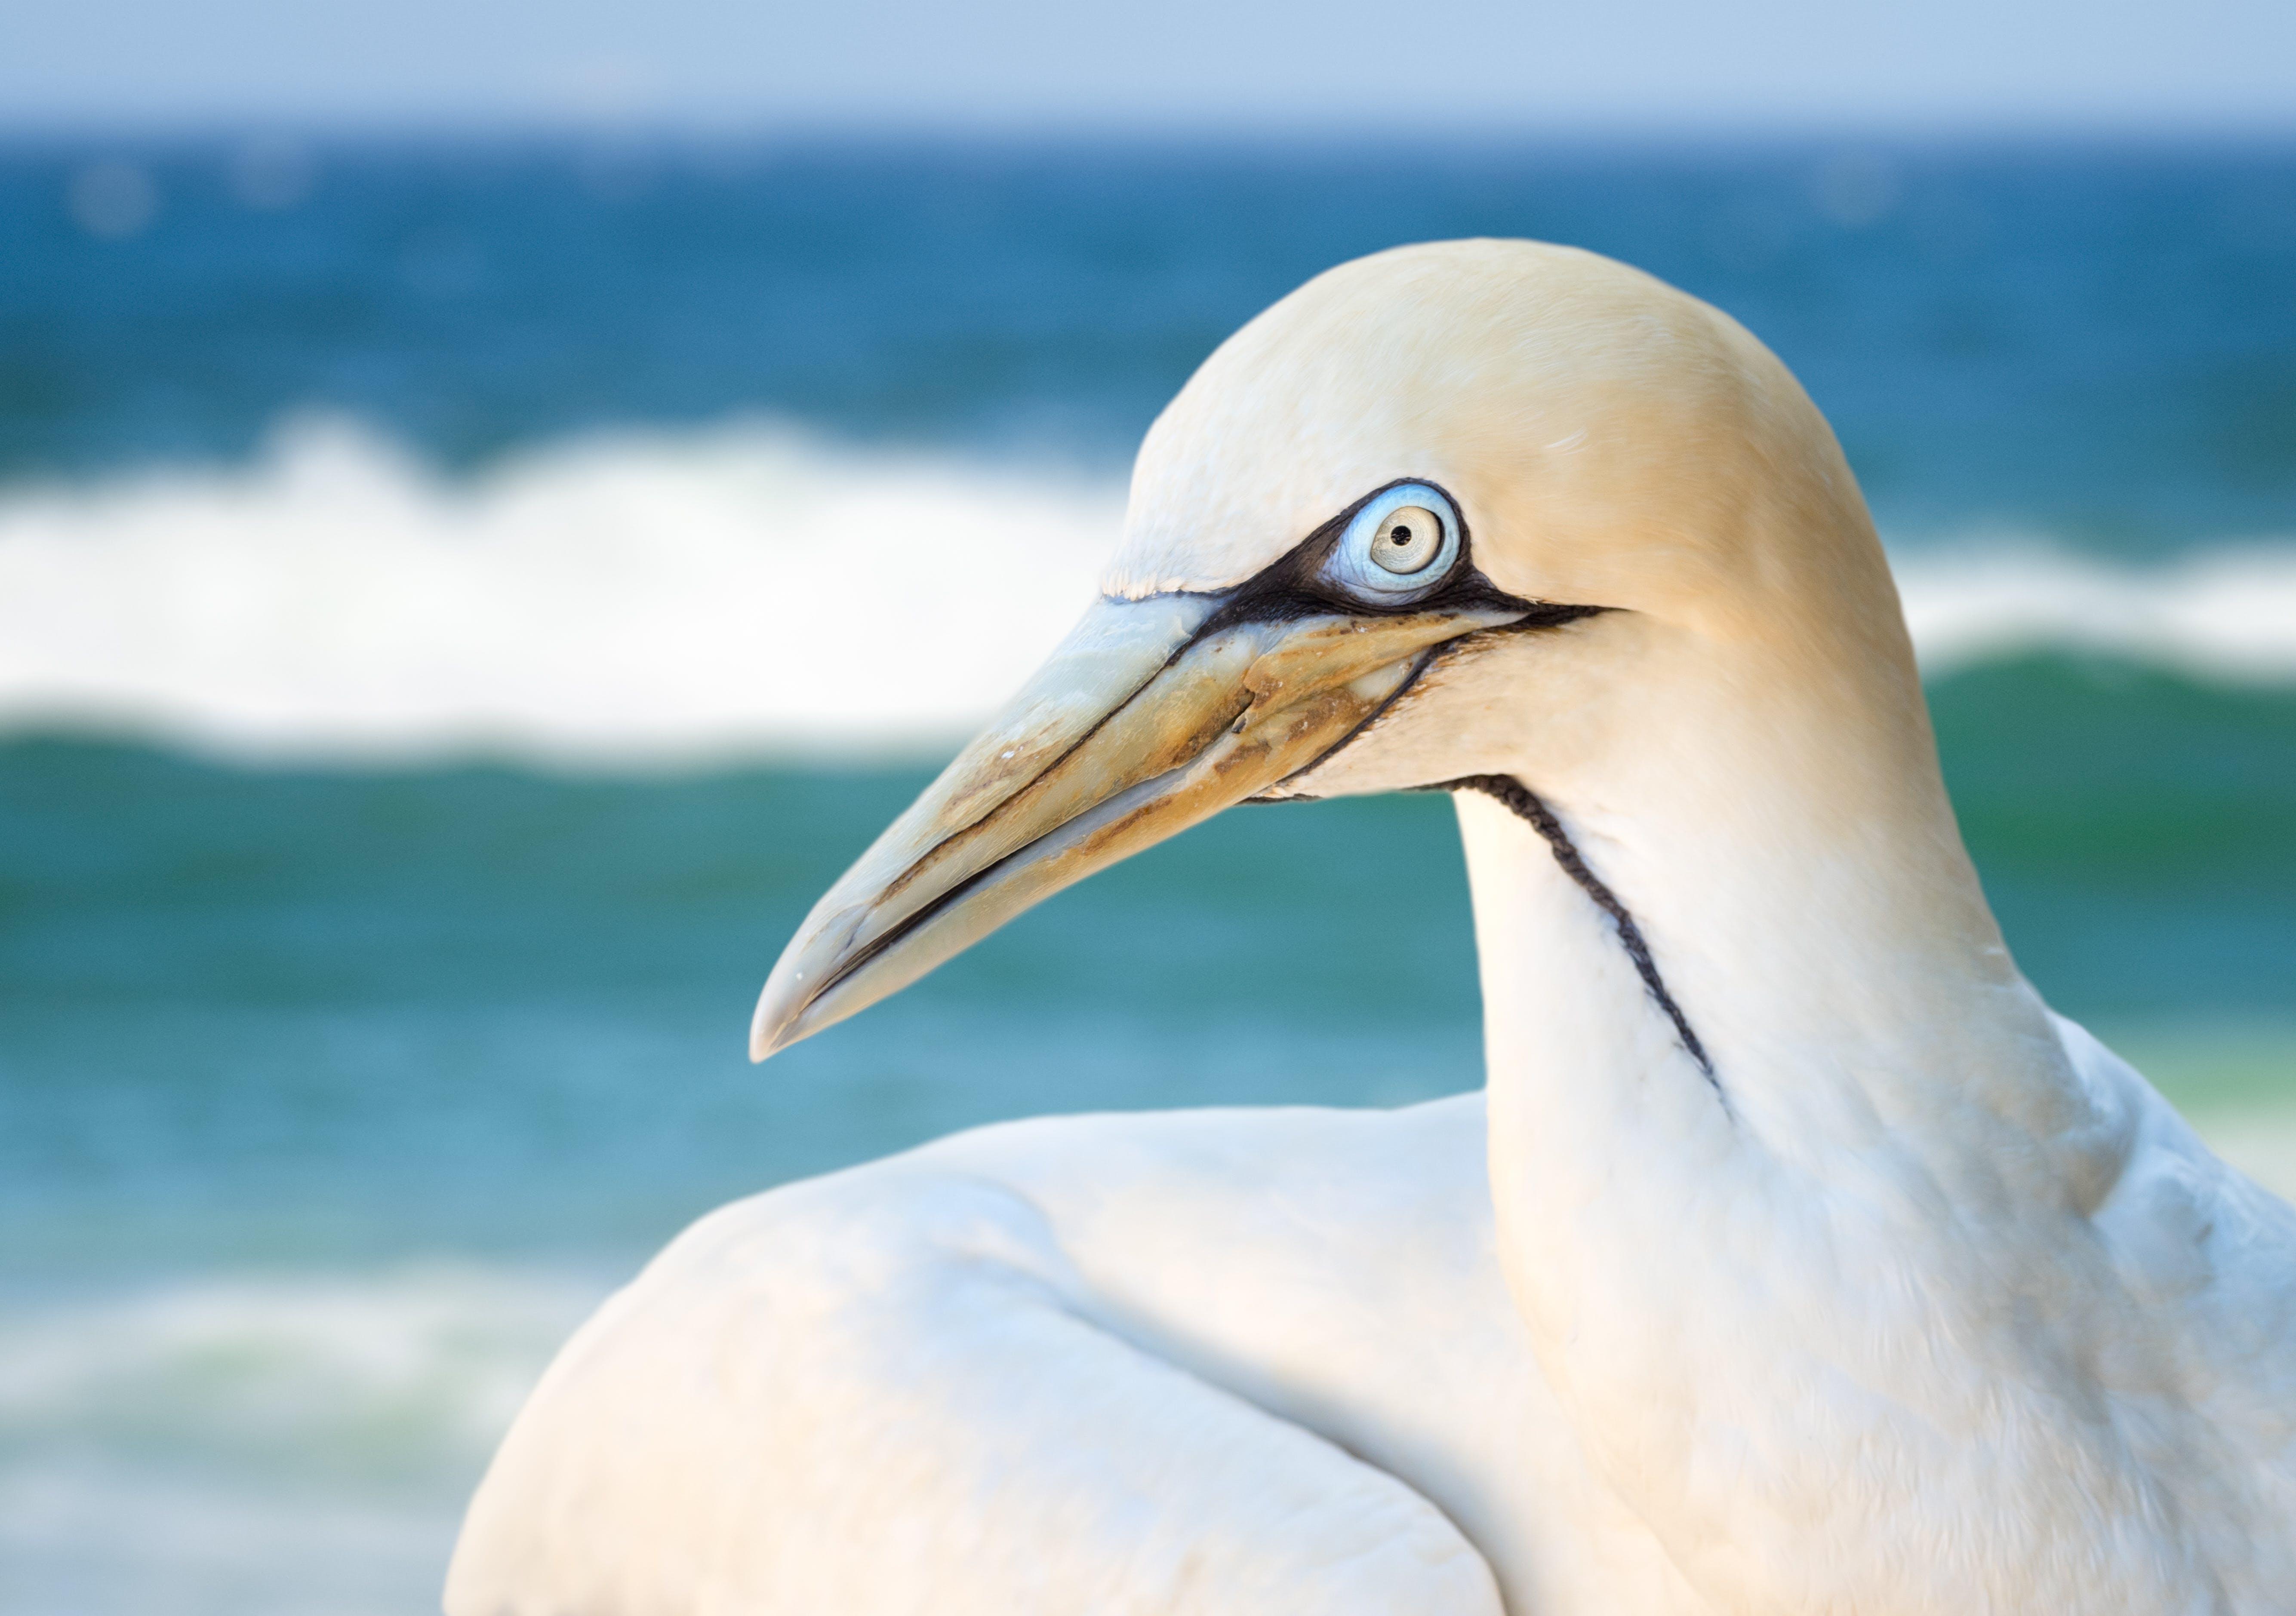 Close-up Photo of Albatross Bird